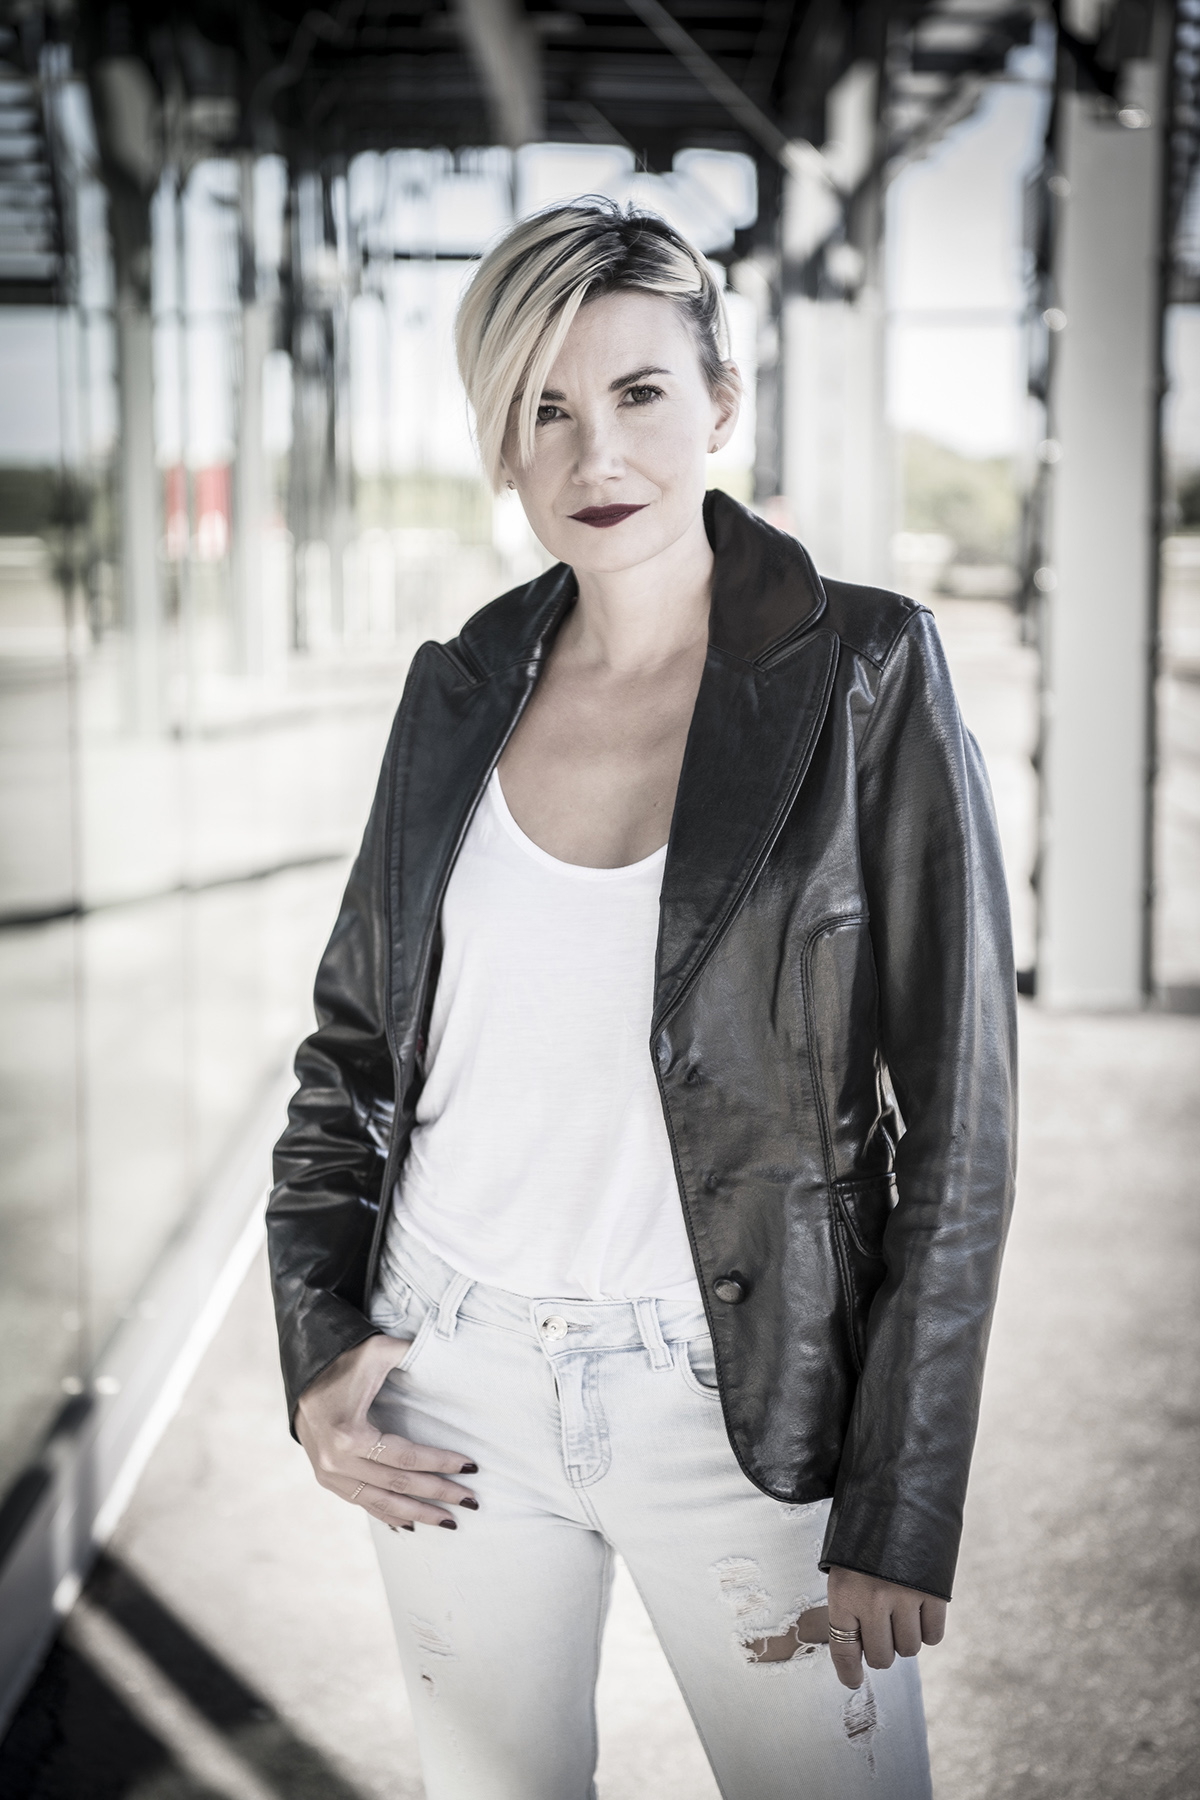 photo Jean-Sébastien Cossette